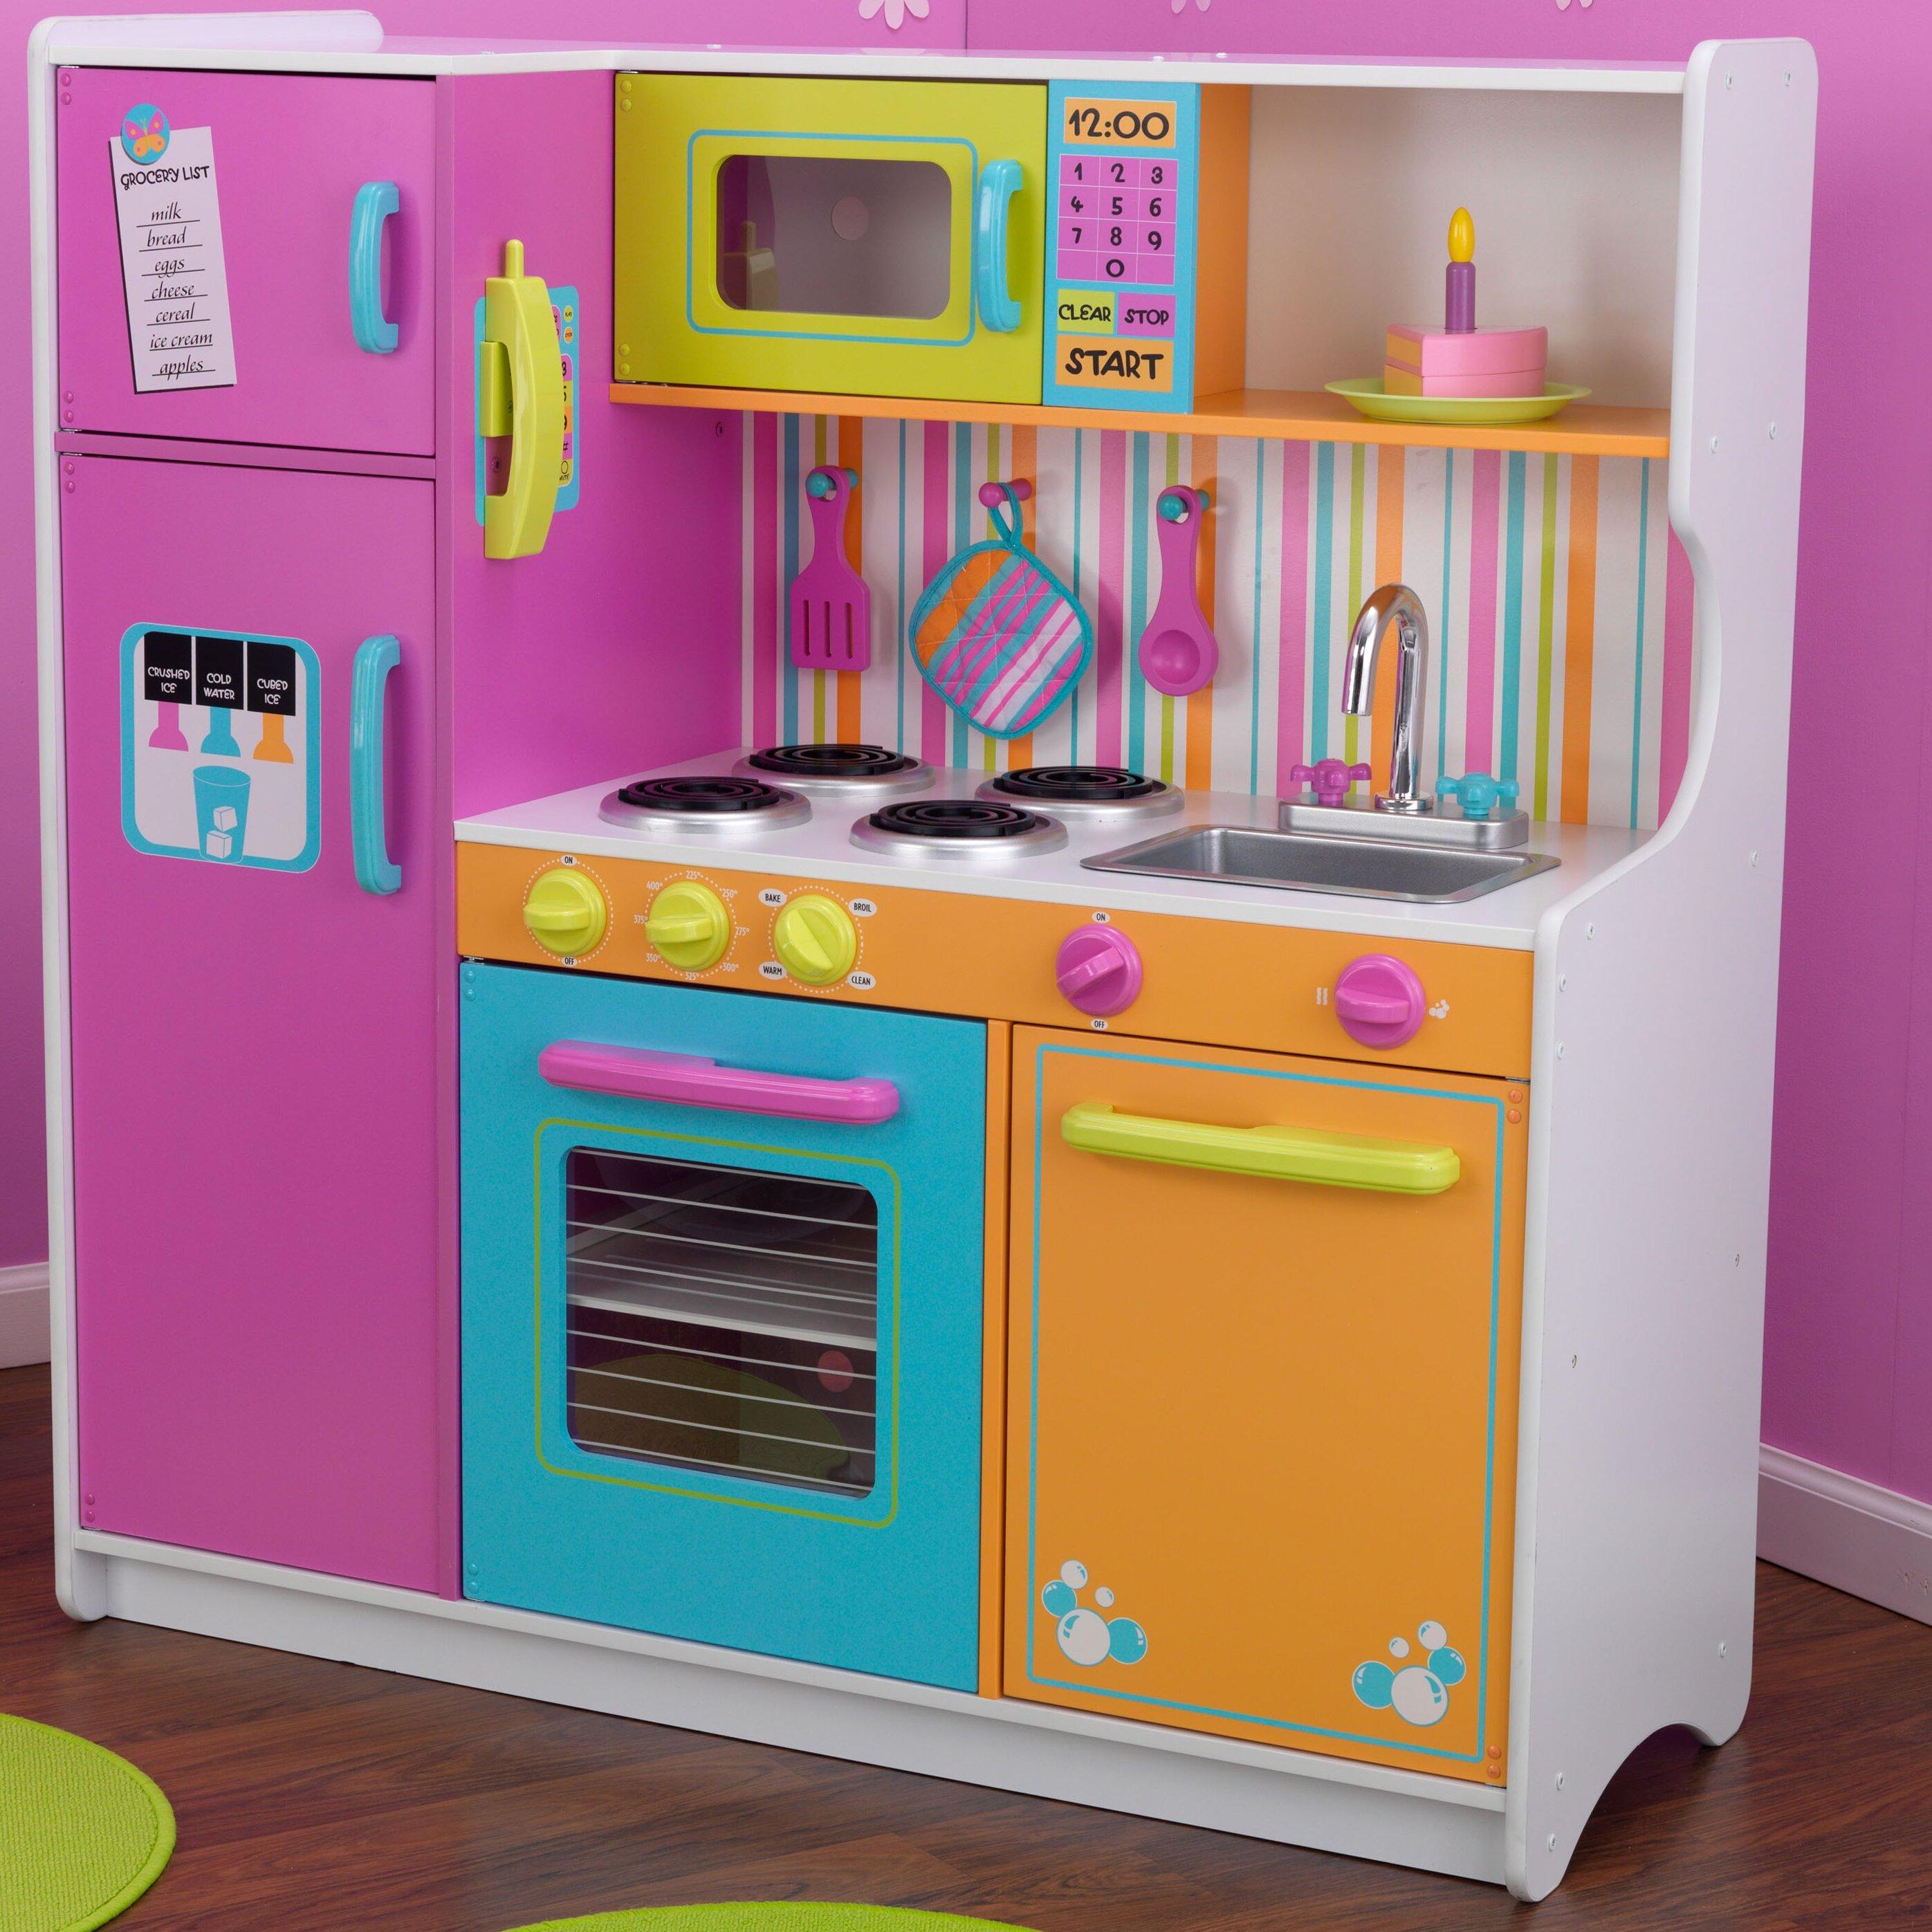 KidKraft Deluxe Big & Bright Kitchen Set & Reviews | Wayfair